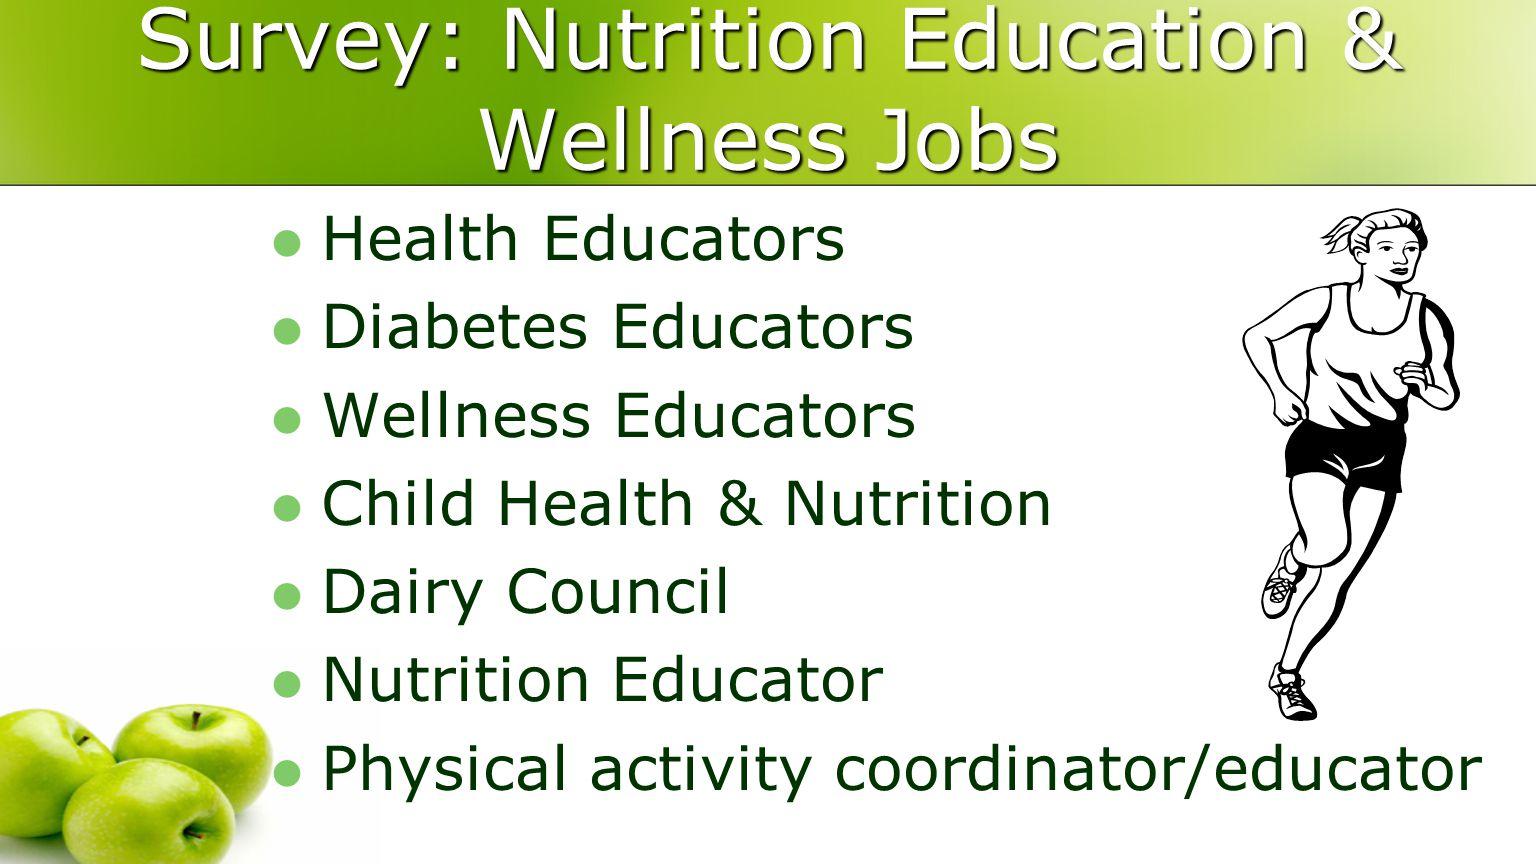 Survey: Nutrition Education & Wellness Jobs Health Educators Diabetes Educators Wellness Educators Child Health & Nutrition Dairy Council Nutrition Educator Physical activity coordinator/educator